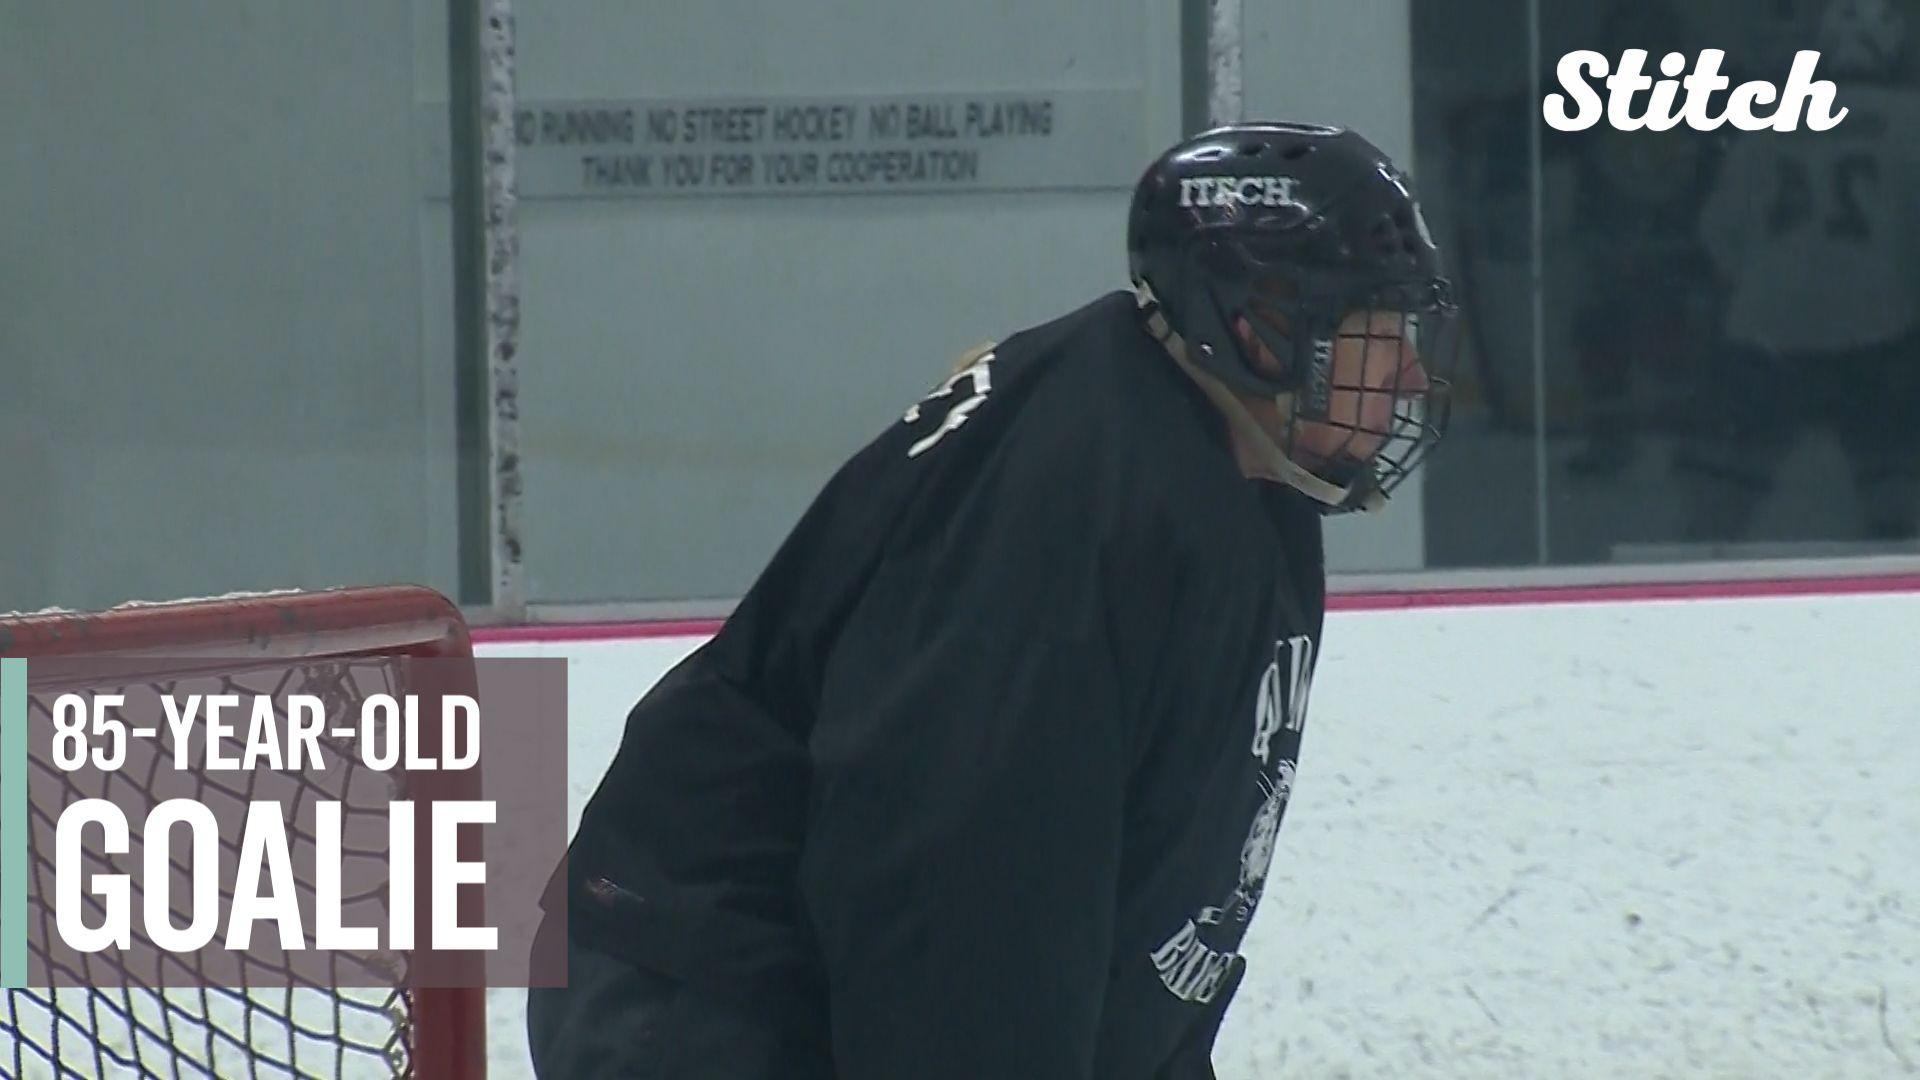 Friends Love Of The Game Keeps 85 Year Old Hockey Goalie Between